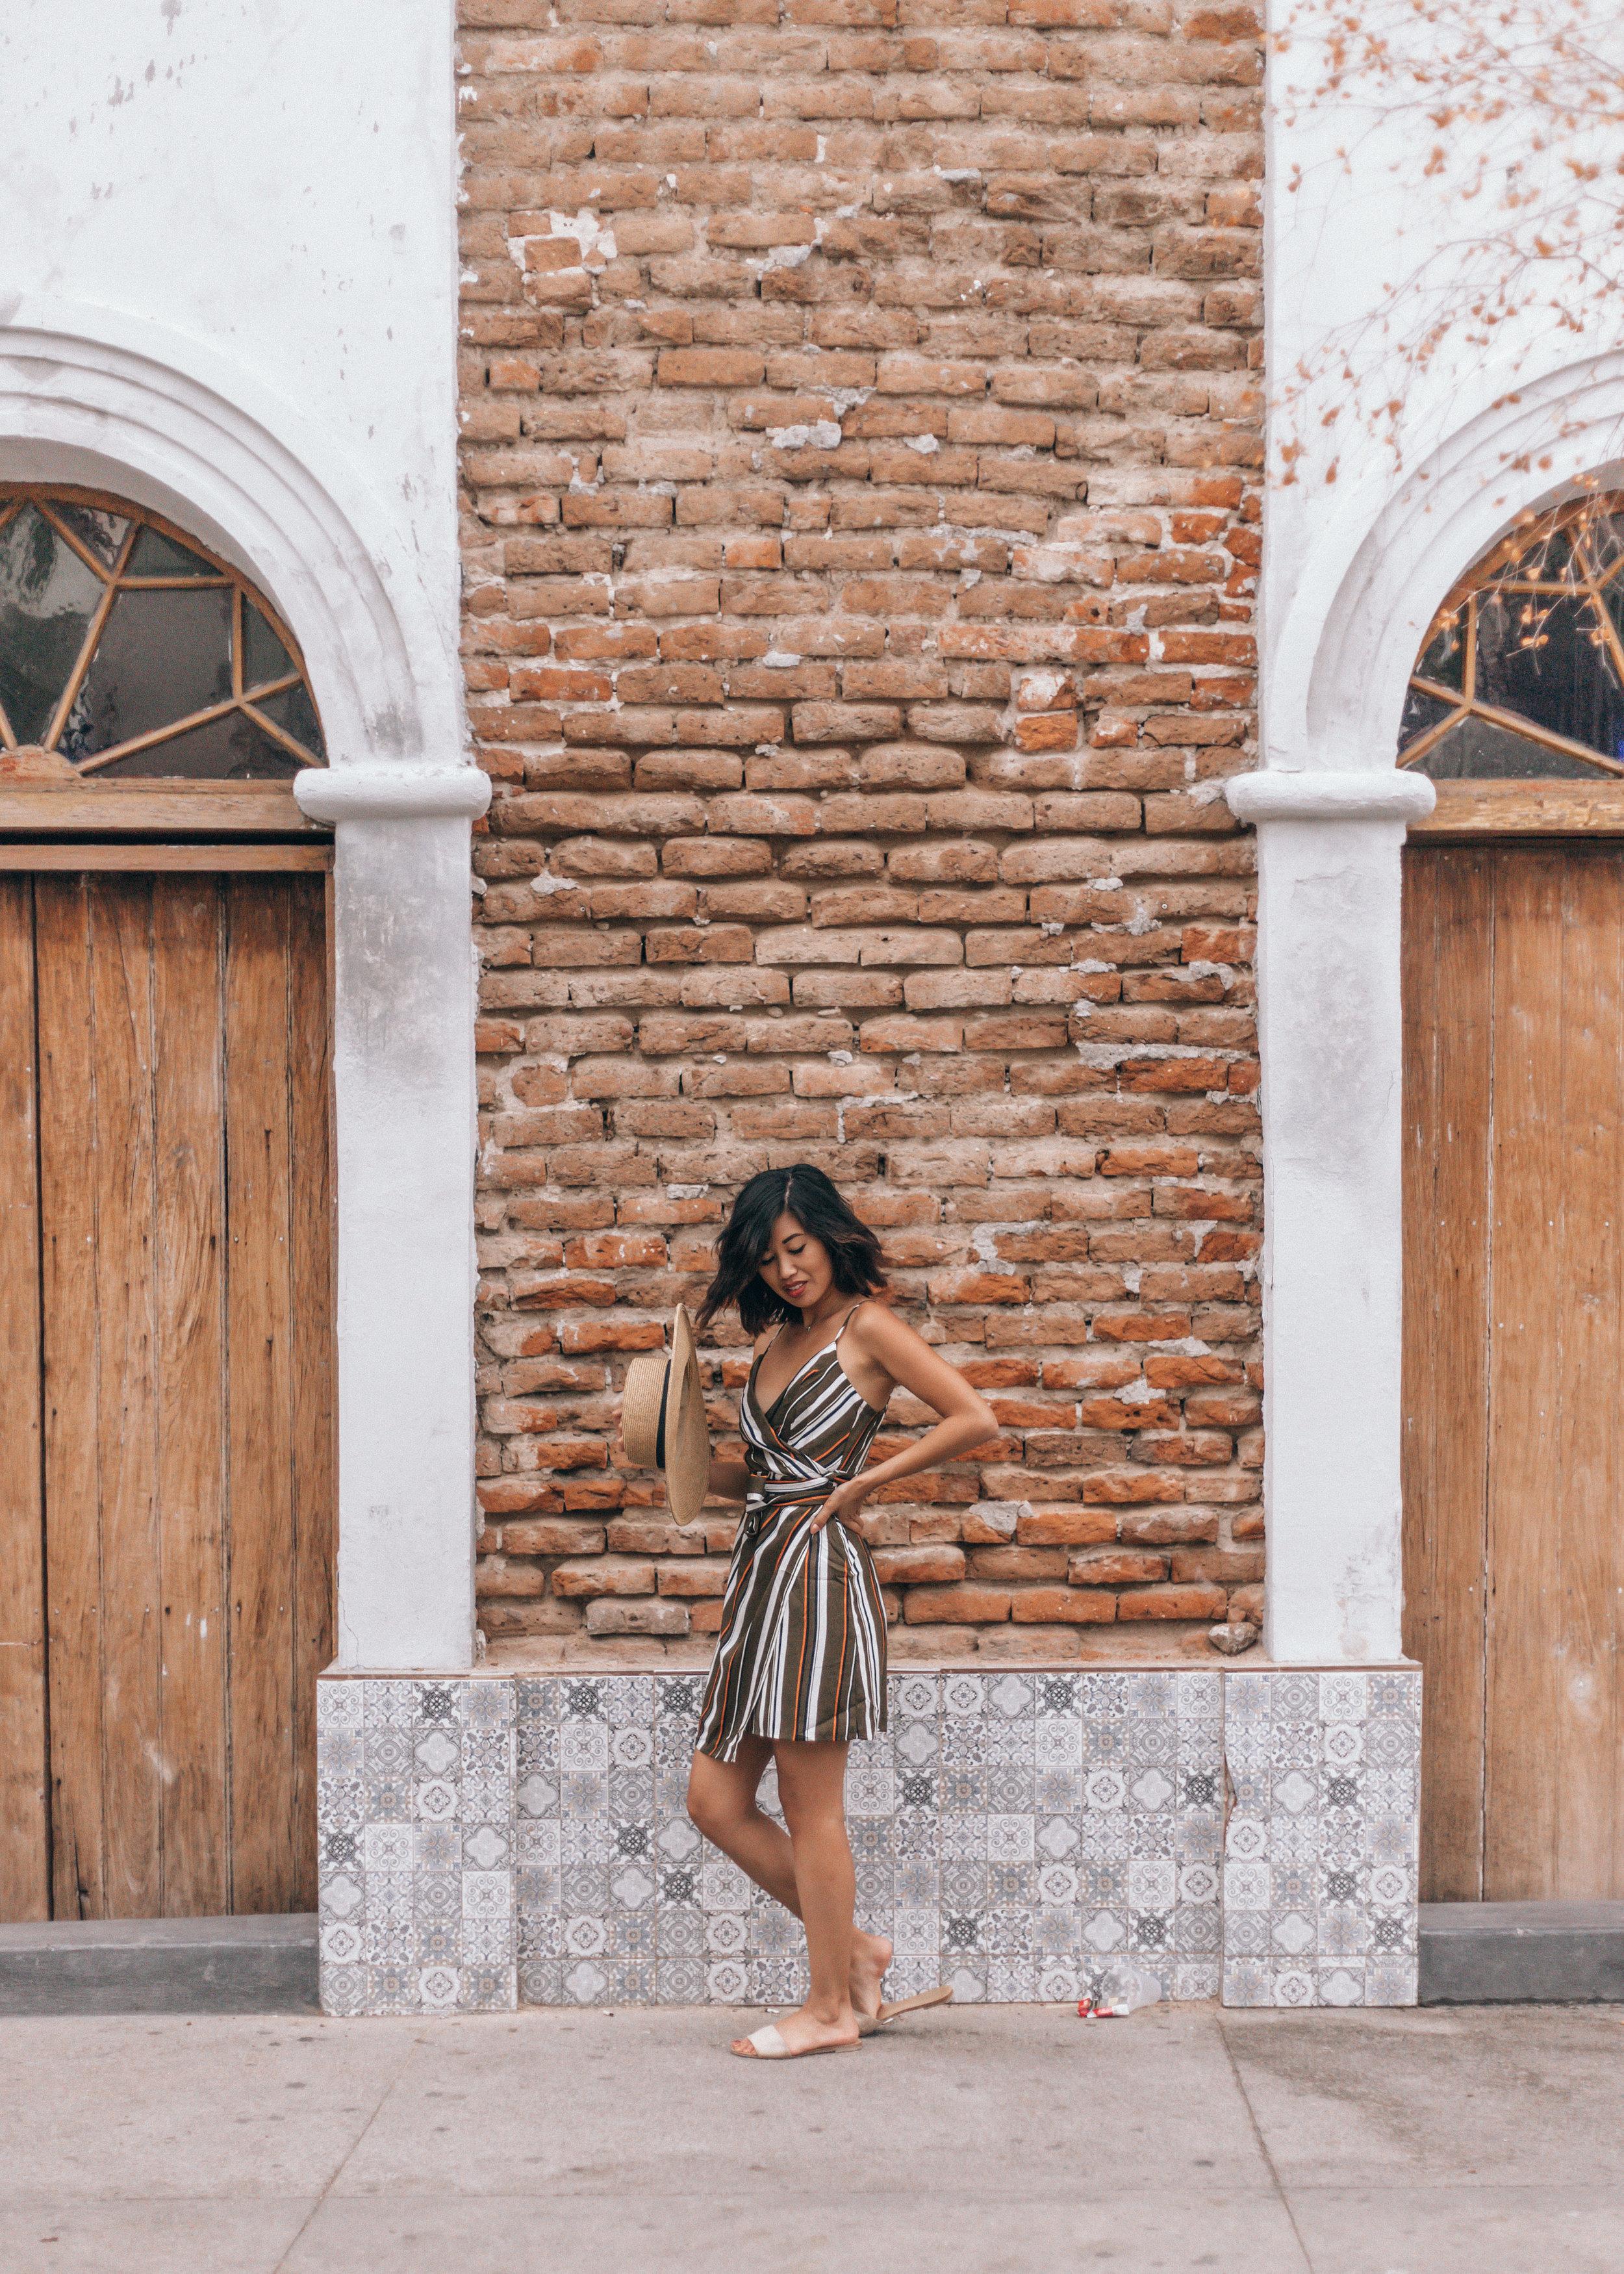 la-paz-mexico-by-lisa-linh